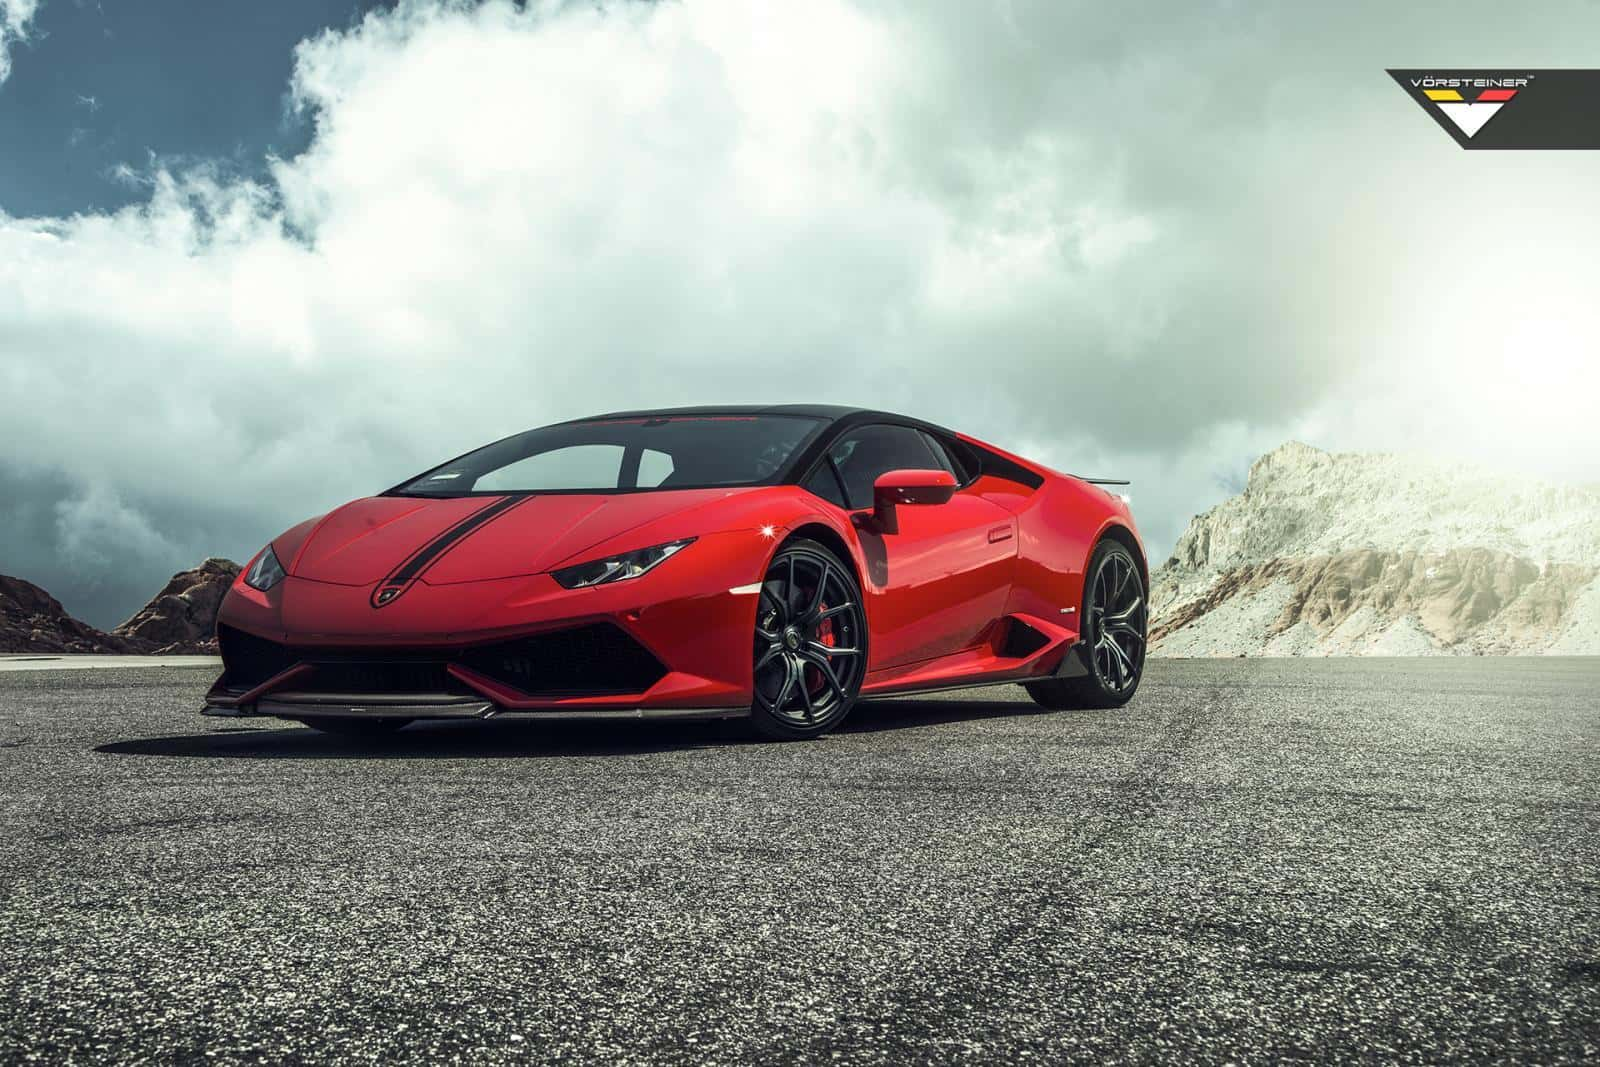 Lamborghini Huracan Verona Edizione